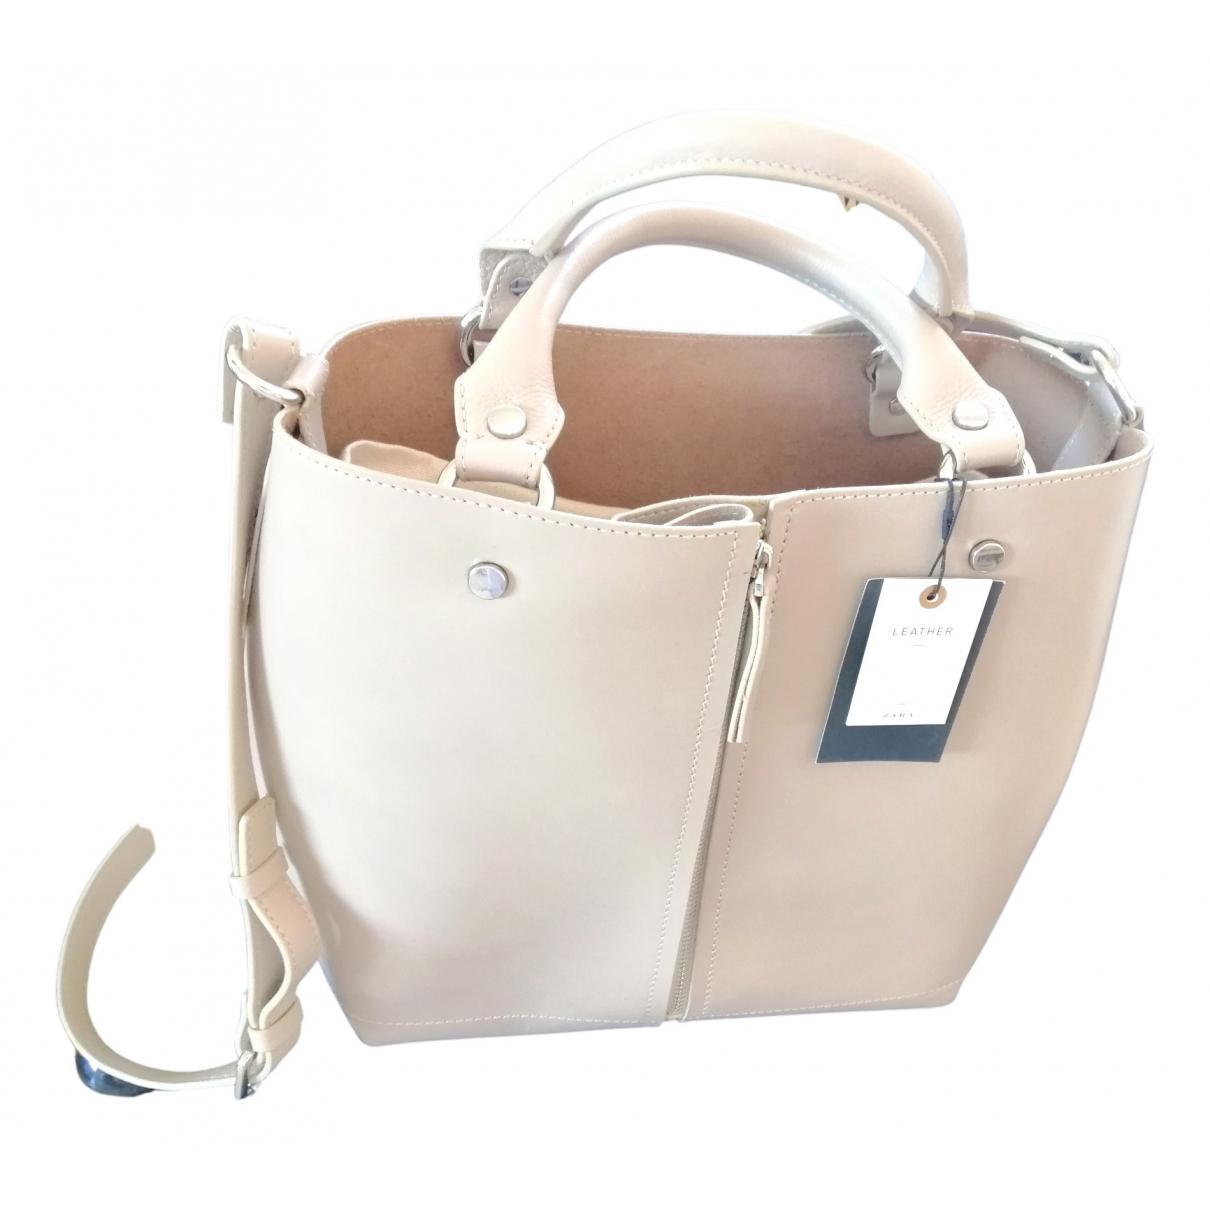 Zara N Beige Leather handbag for Women N